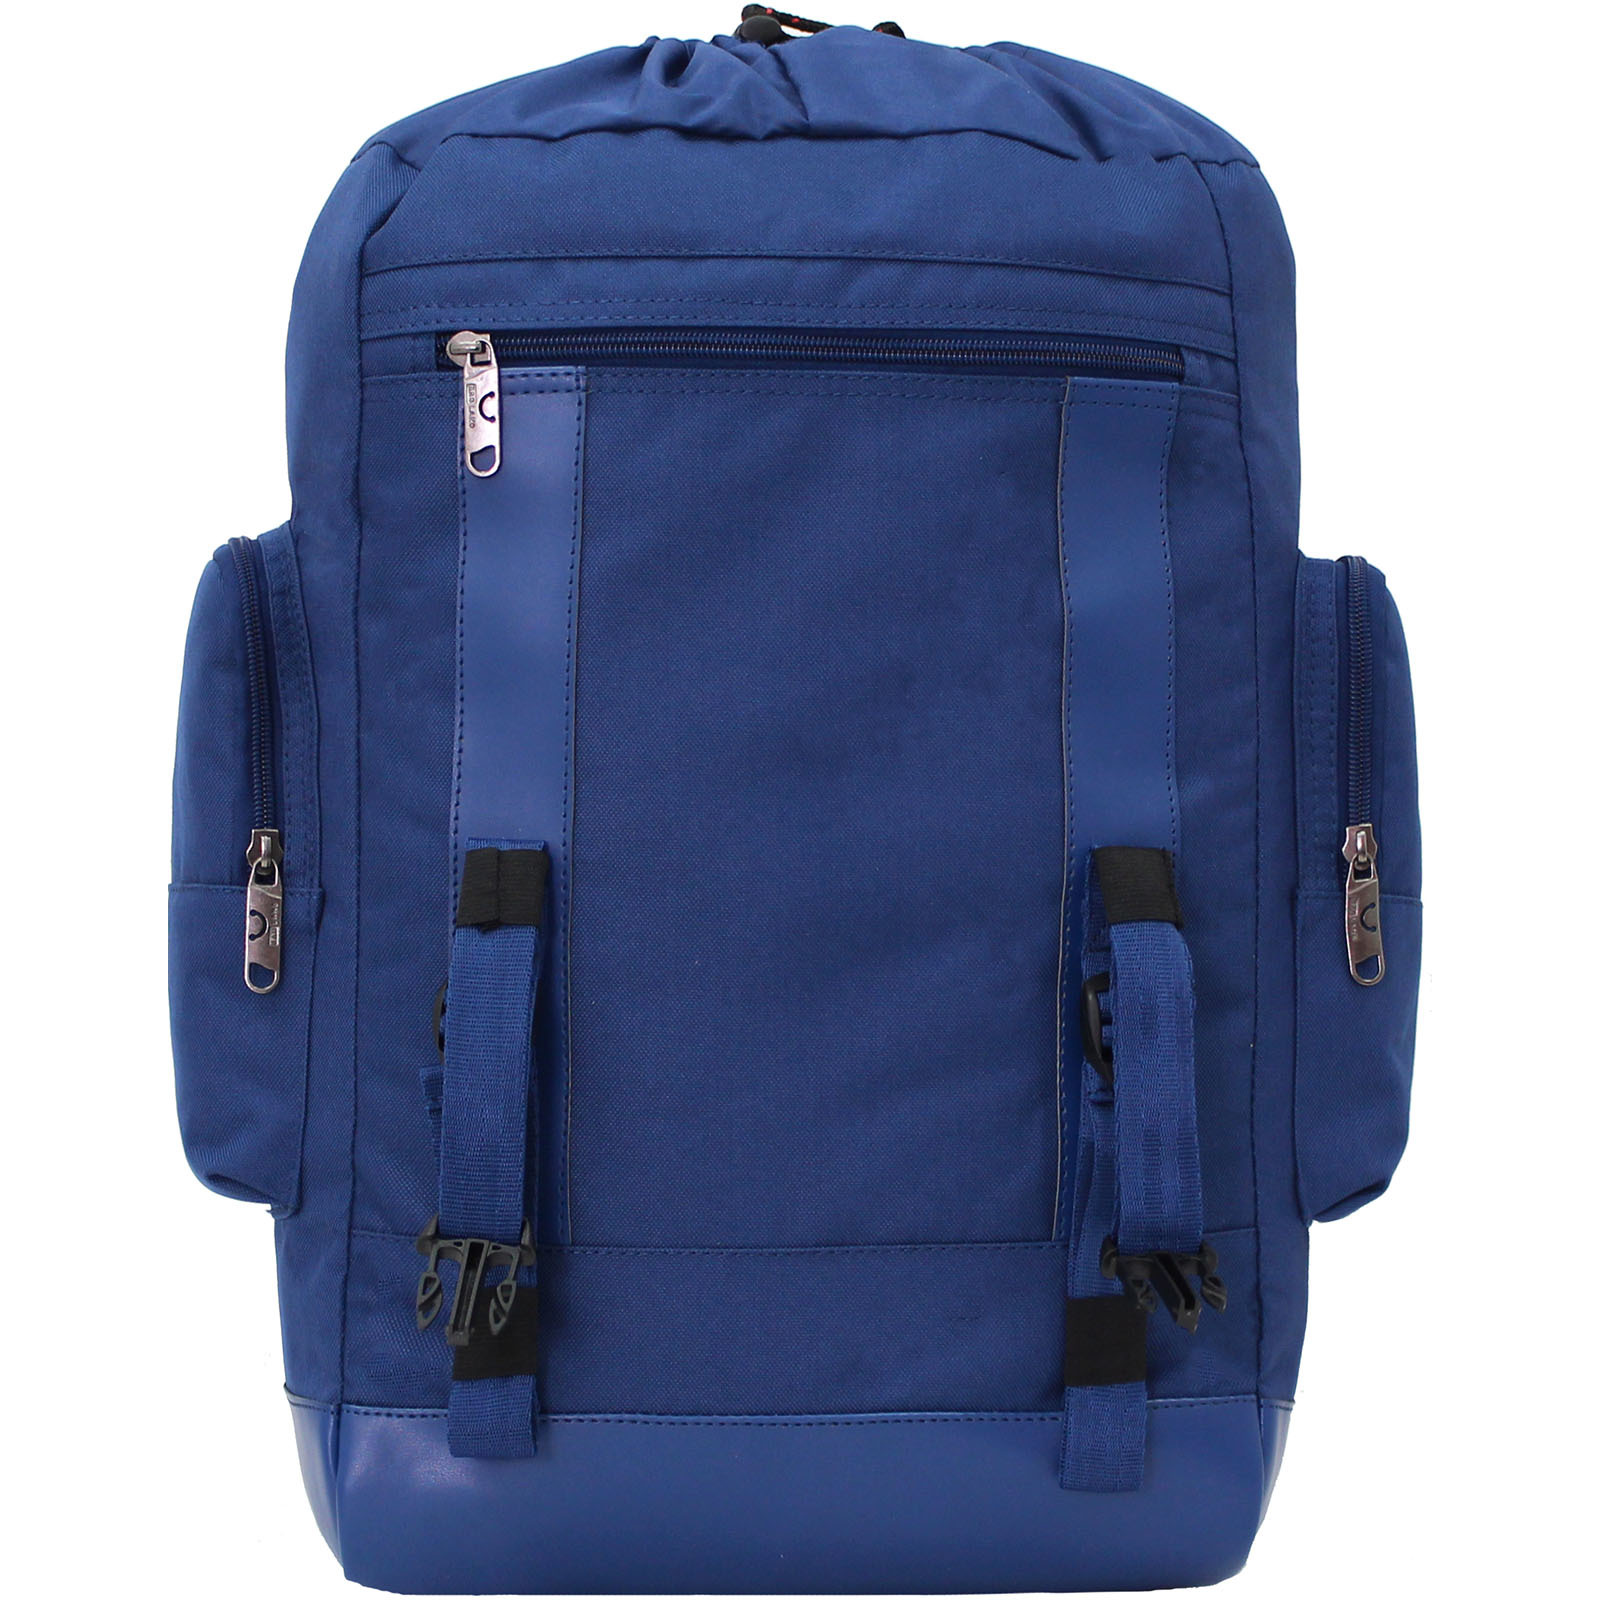 Рюкзак для ноутбука Bagland Palermo 25 л. Синий (0017966) фото 4